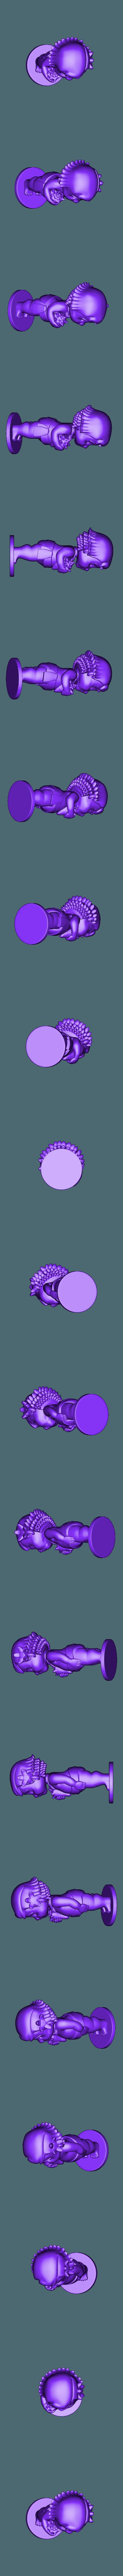 moana 3dPrintLow.STL Download STL file hawaii princess • 3D print template, tridimagina